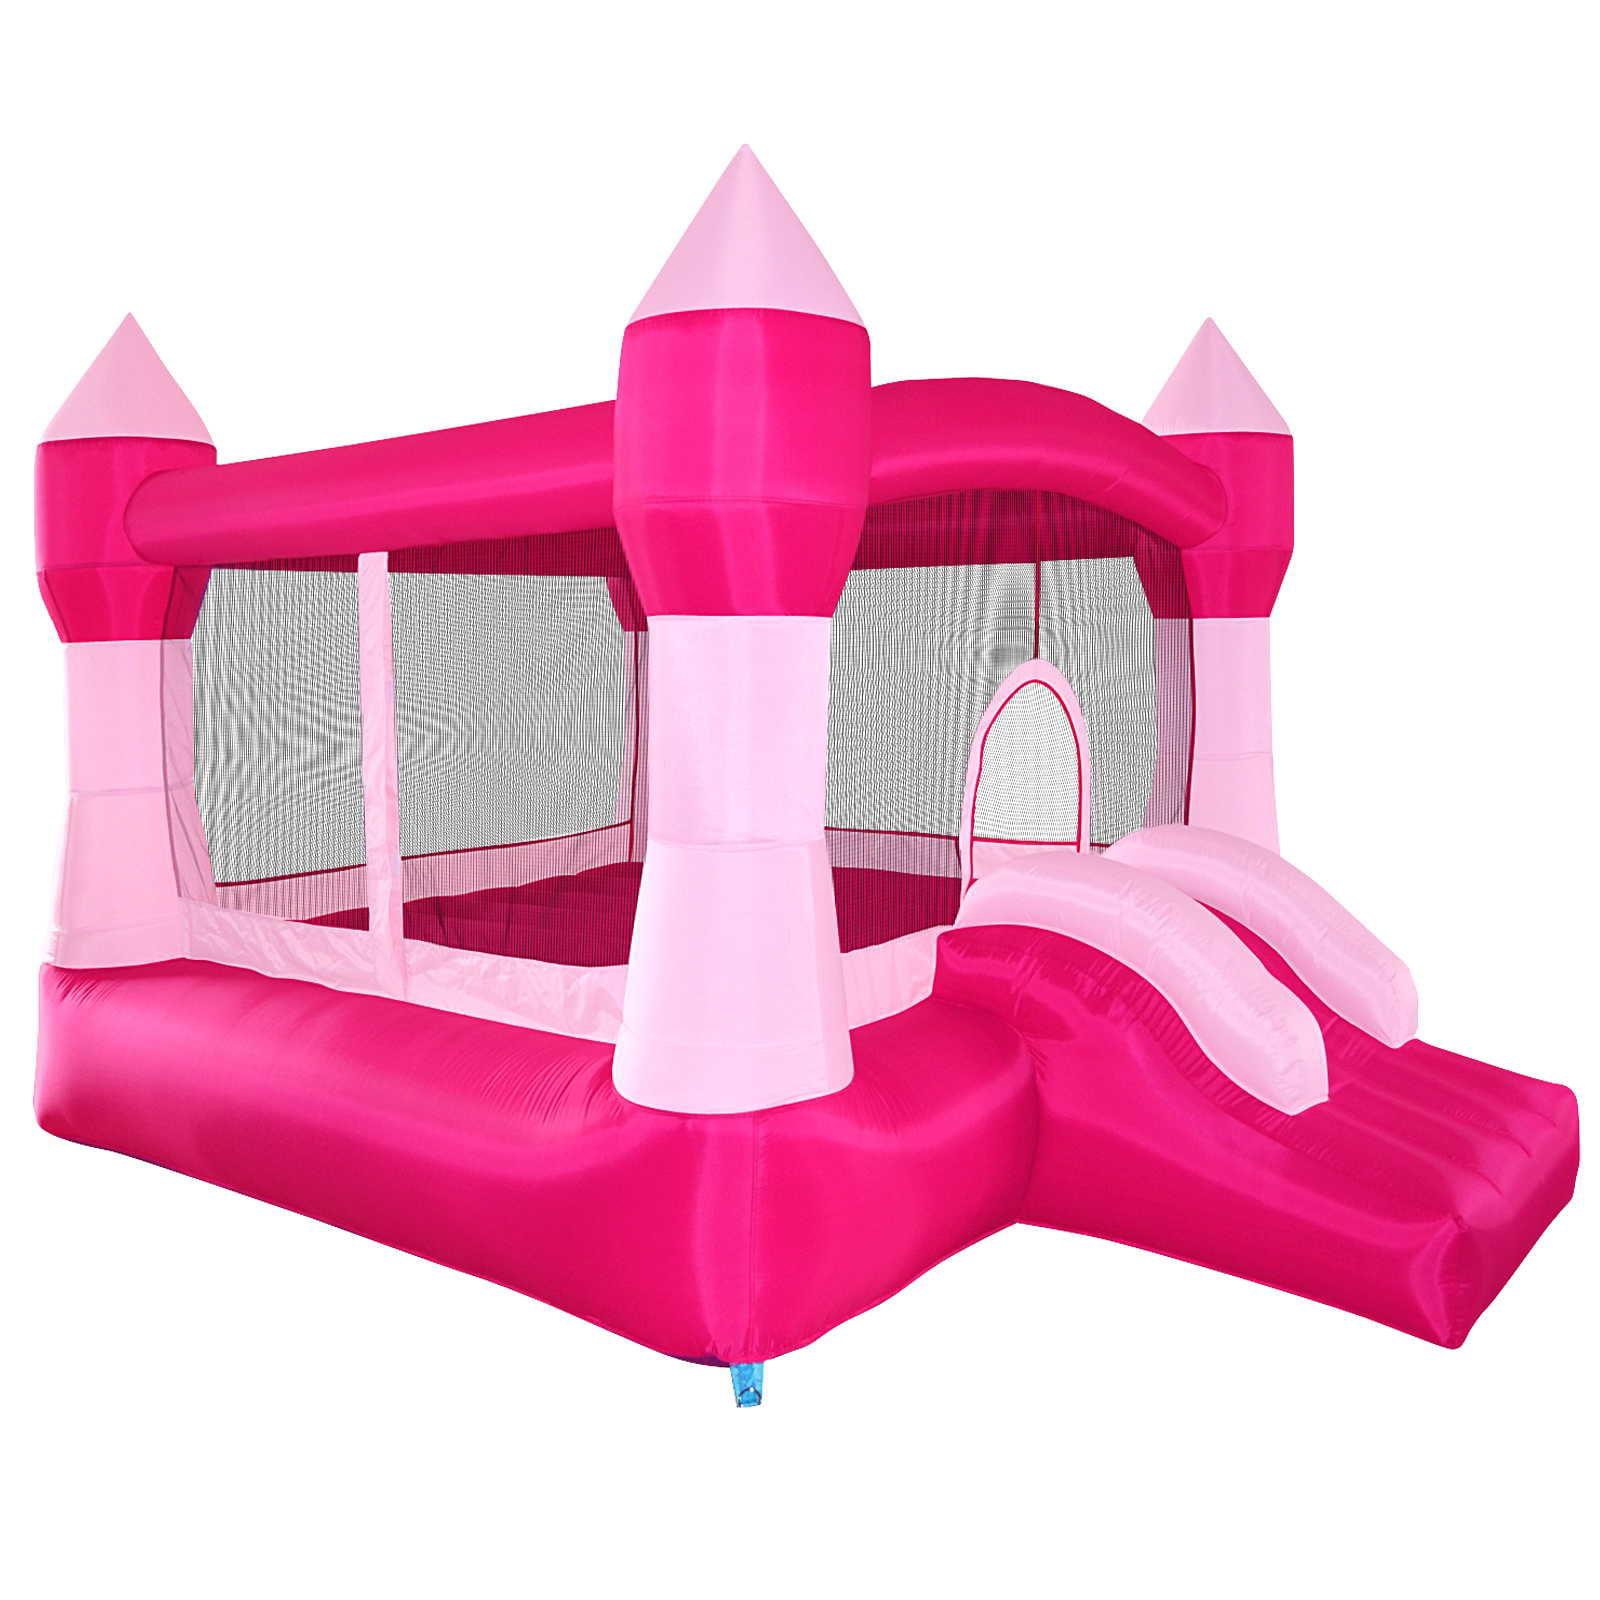 Cloud 9 Princess Inflatable Bounce House - Pink Castle Theme